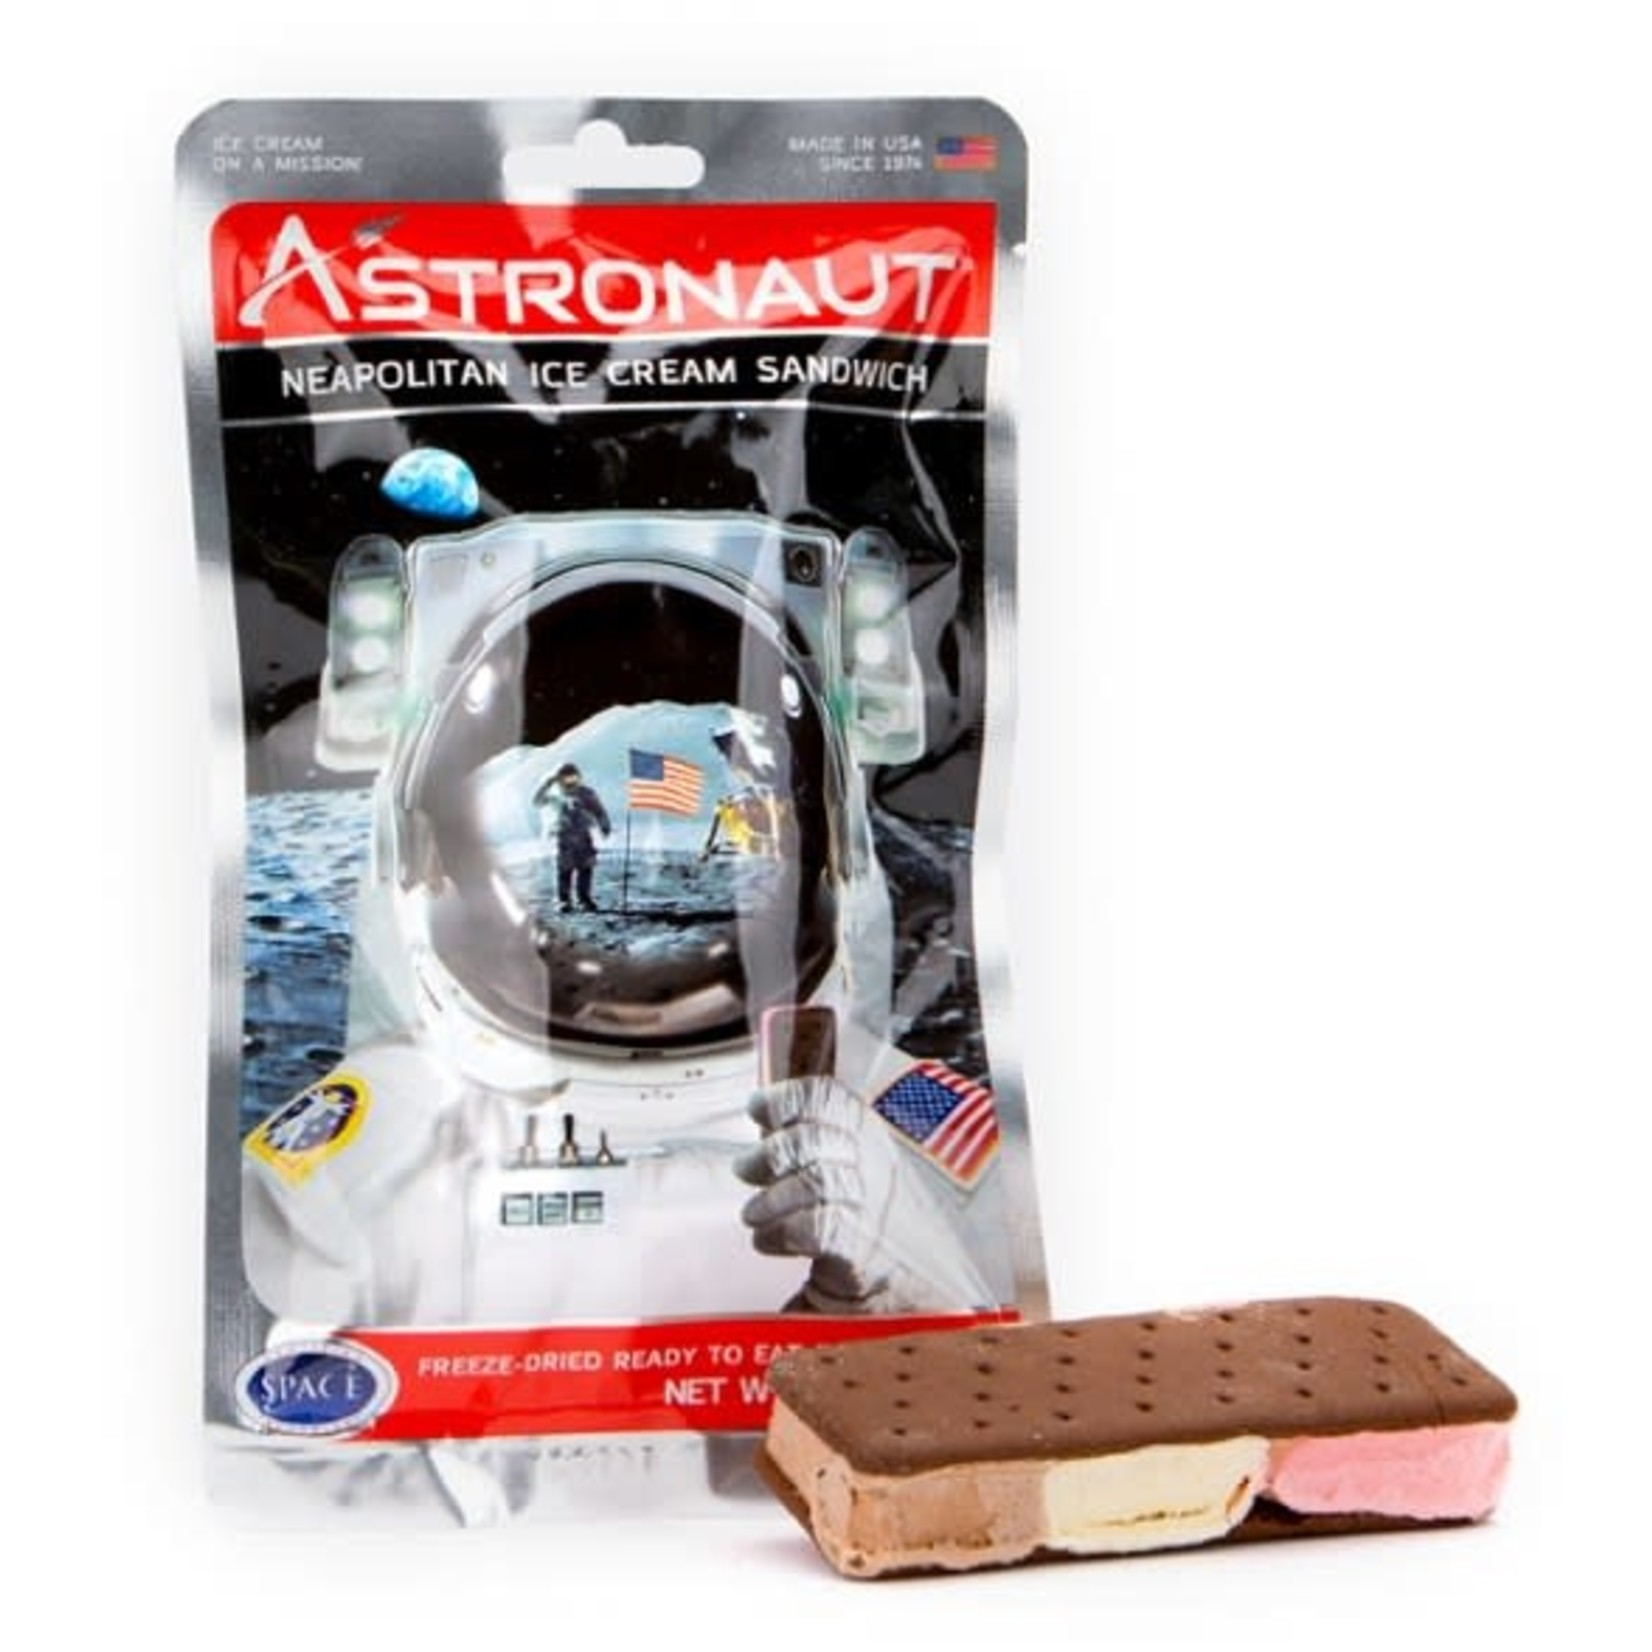 American Outdoor Products Astronaut Neapolitan Ice Cream Sandwich